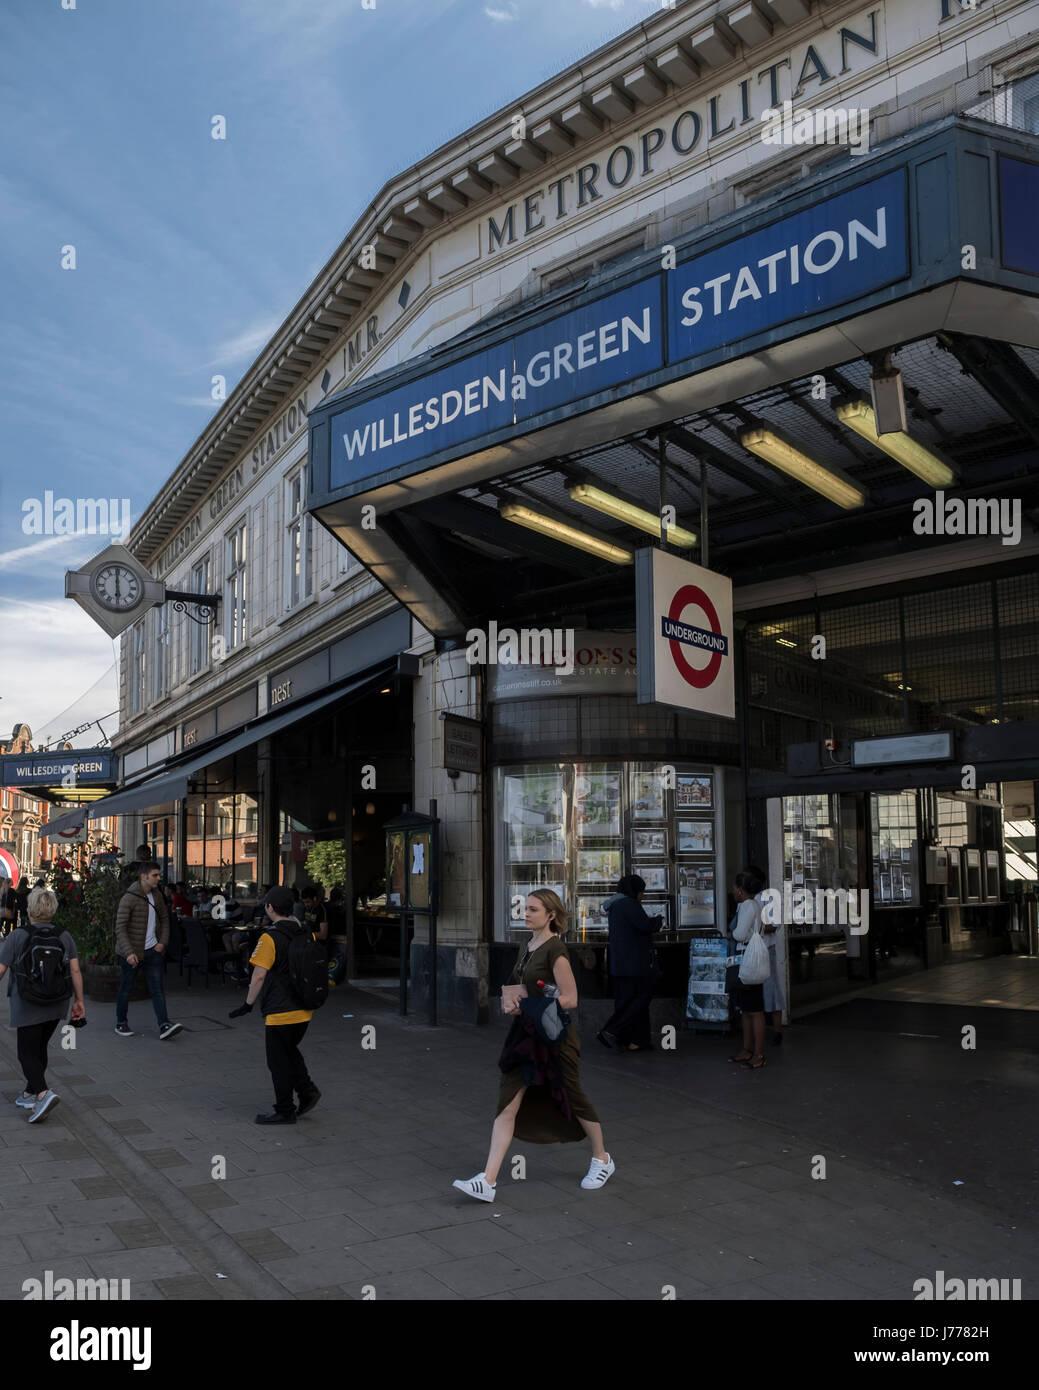 Willesden Green station - Stock Image